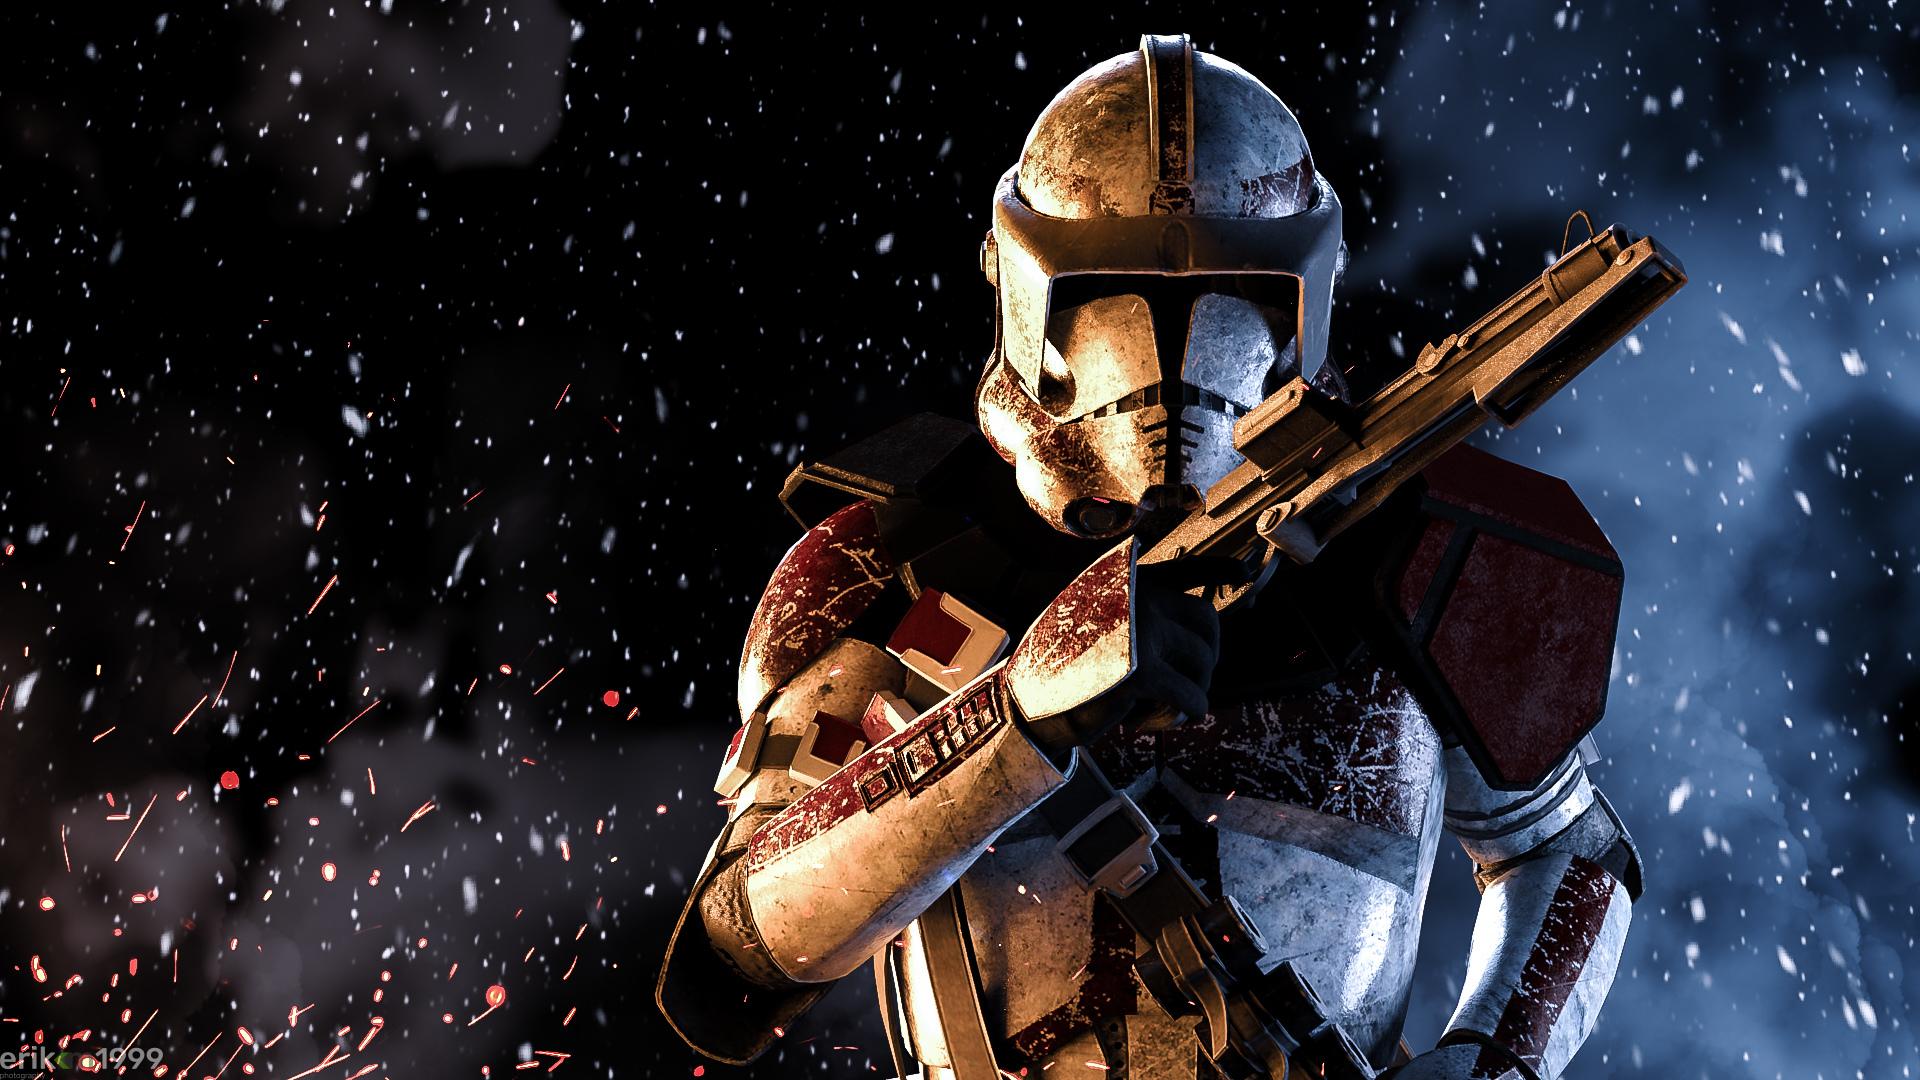 Download 1920x1080 Wallpaper Stormtrooper, Star Wars